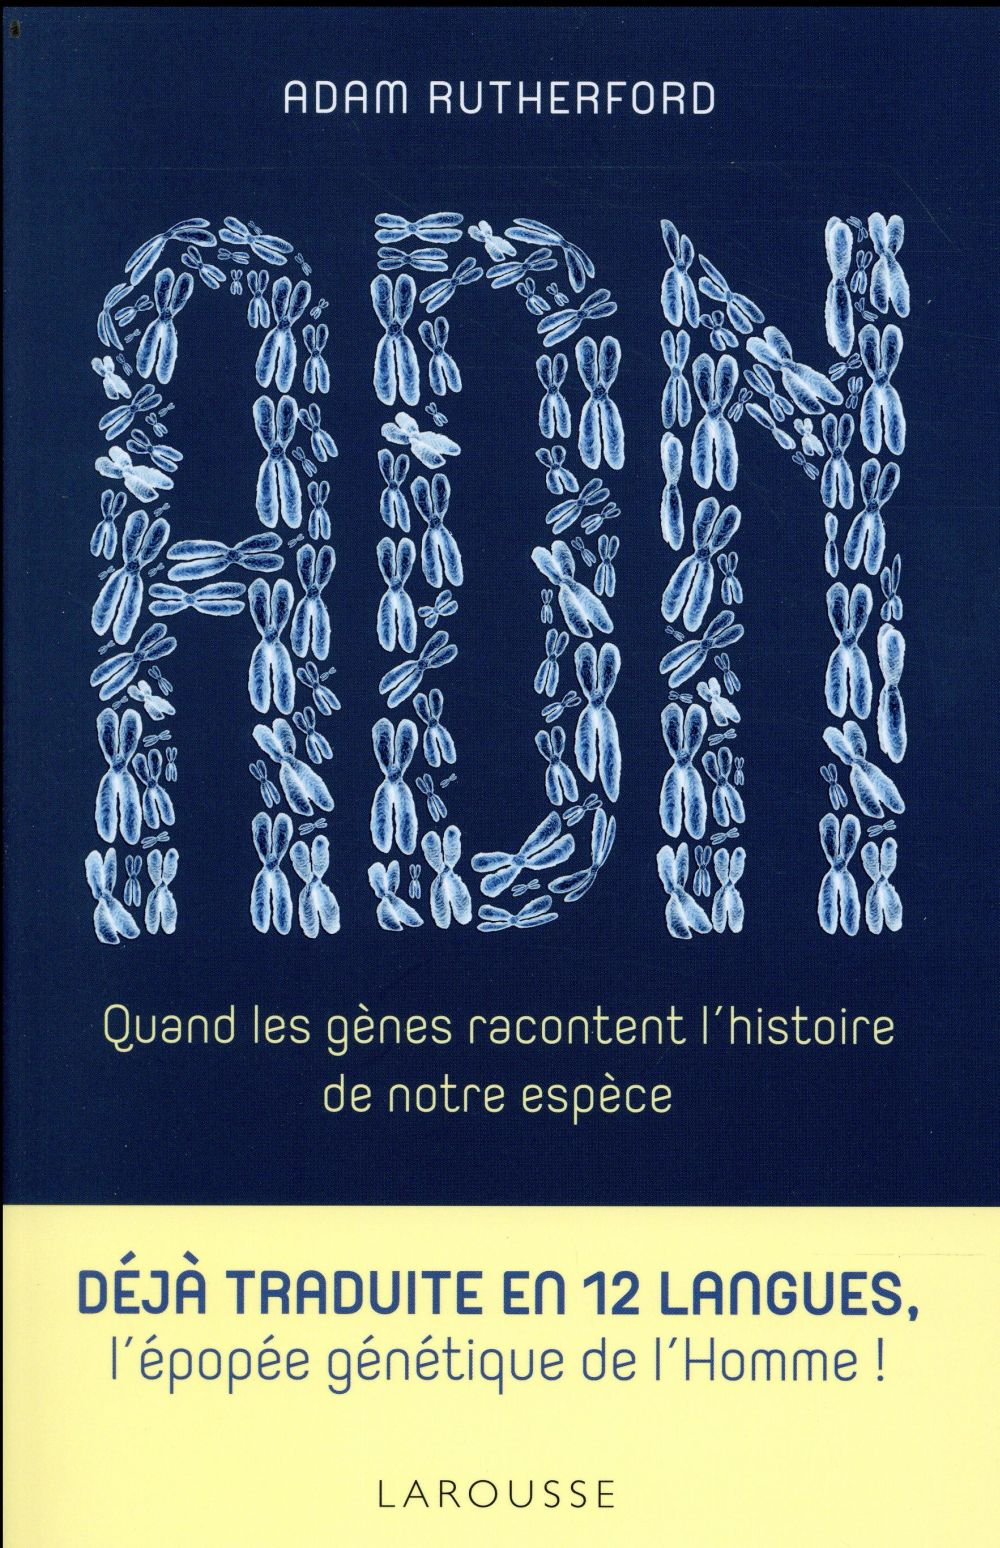 ADN, quand les gènes racontent l'histoire de notre espèce